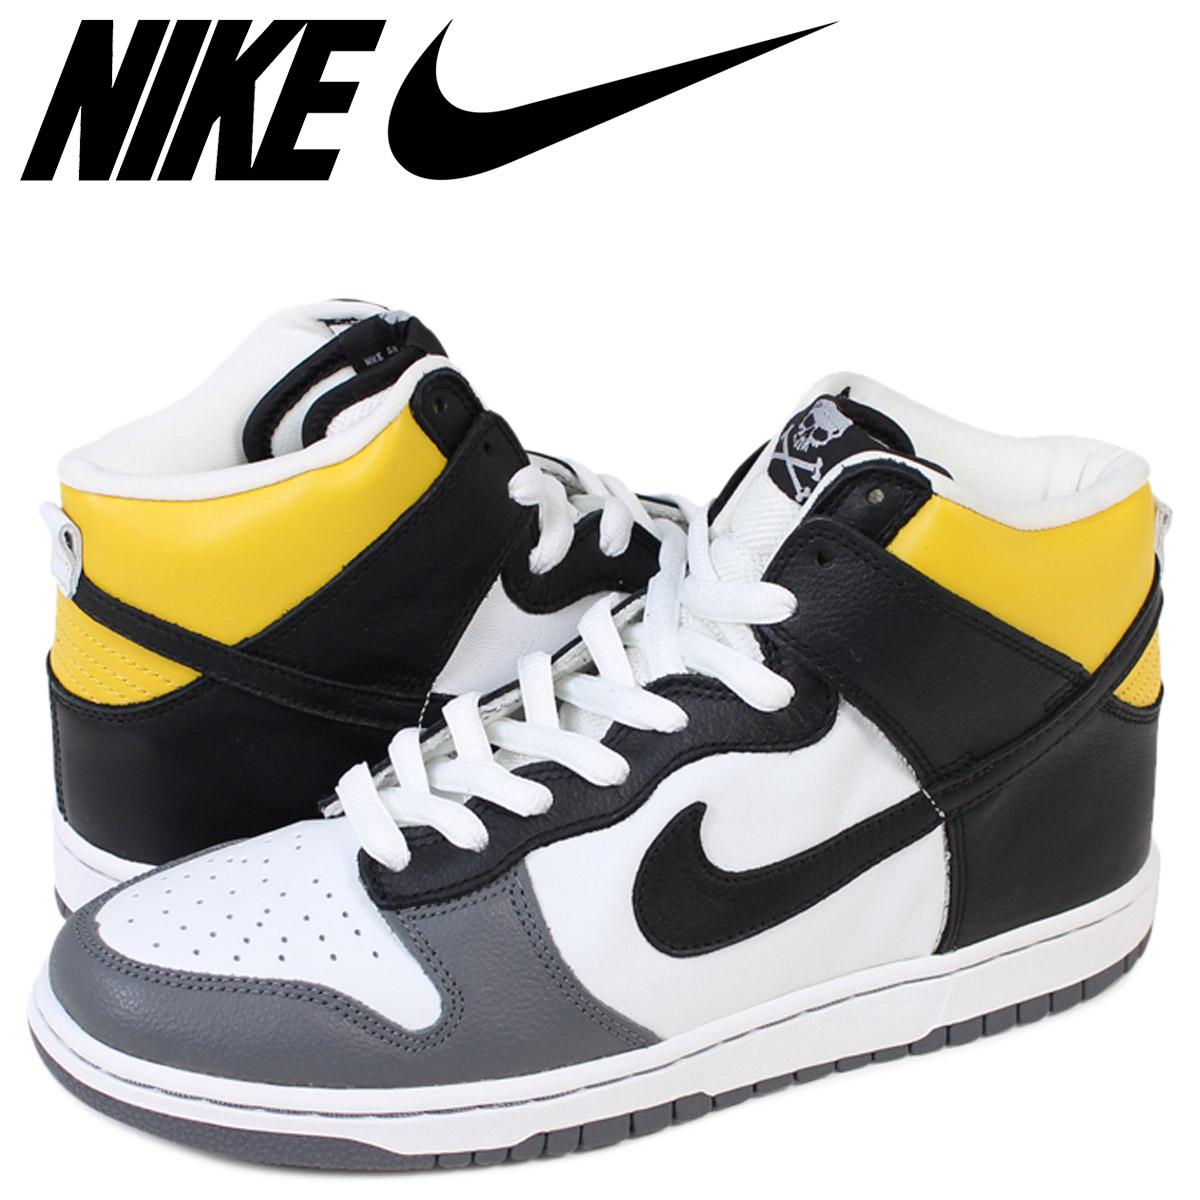 buy popular b858d 48f44 Nike NIKE SB dunk high sneakers DUNK HI PRO DANIEL SHIMIZU 305,050-101  white men